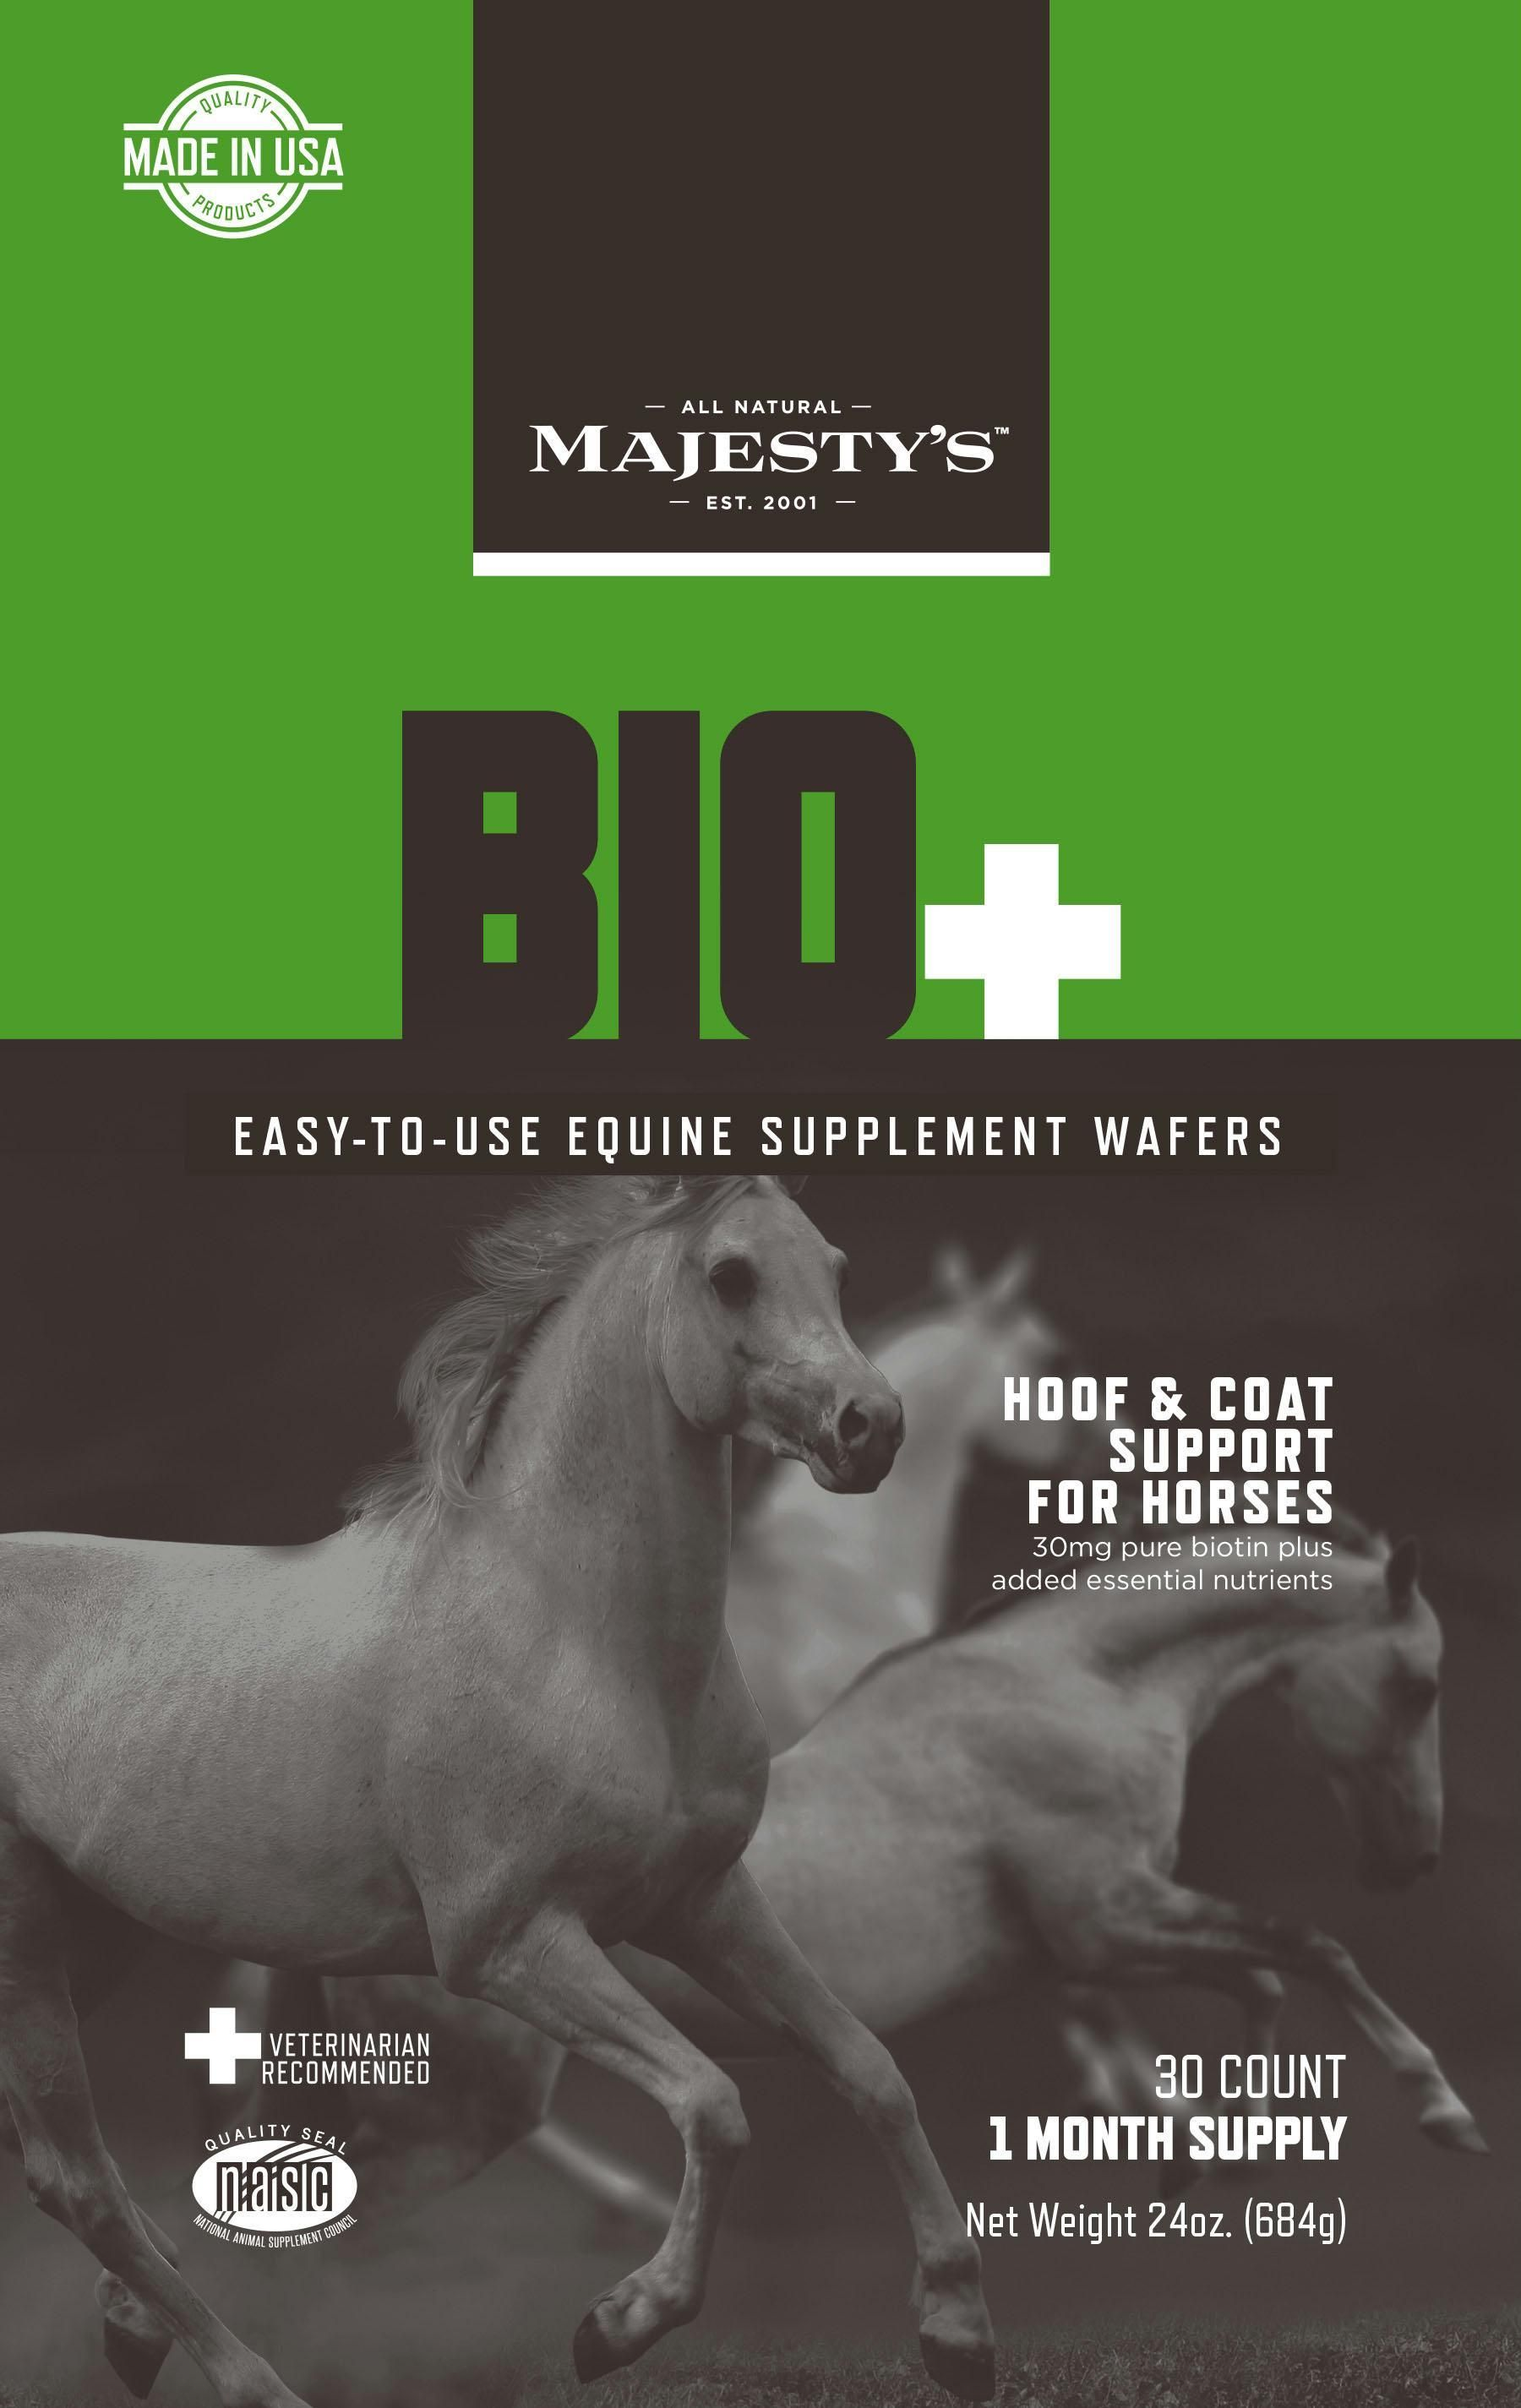 Majesty's Biotin Plus Equine Supplement Wafers Equine